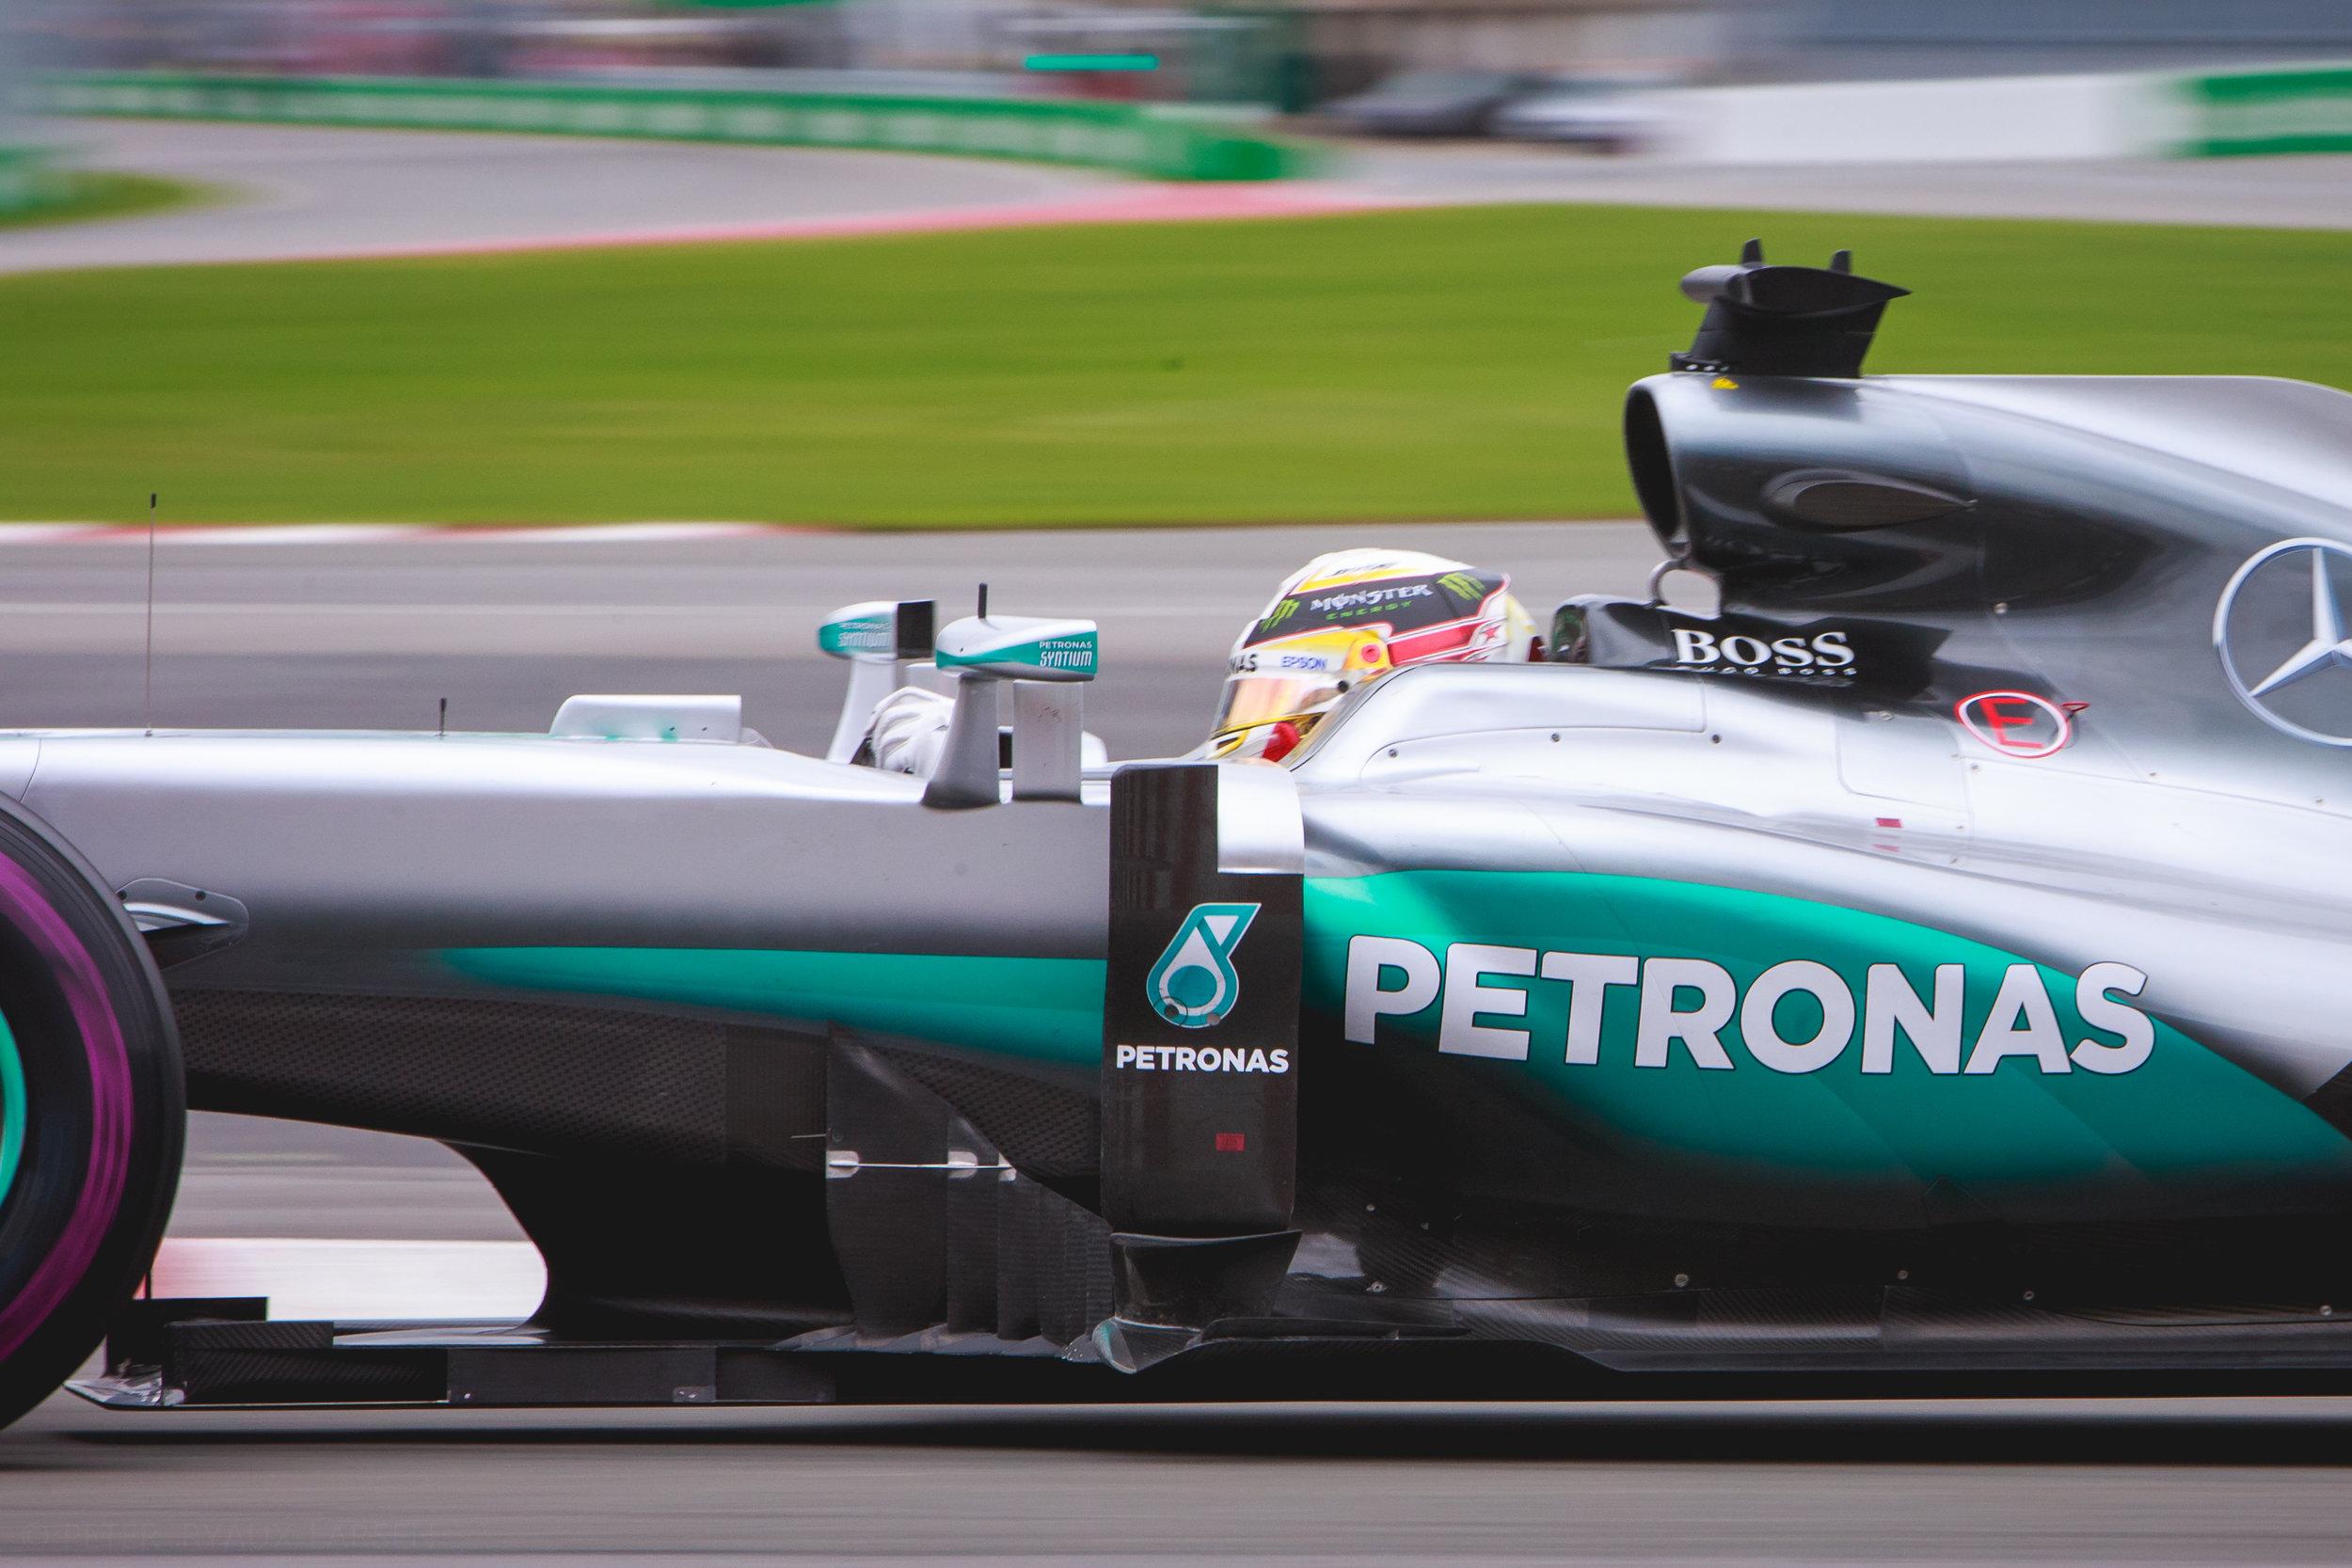 F1 Grand Prinx Canada - Sunday (quick export) - 054 - 20160612-1511.jpg